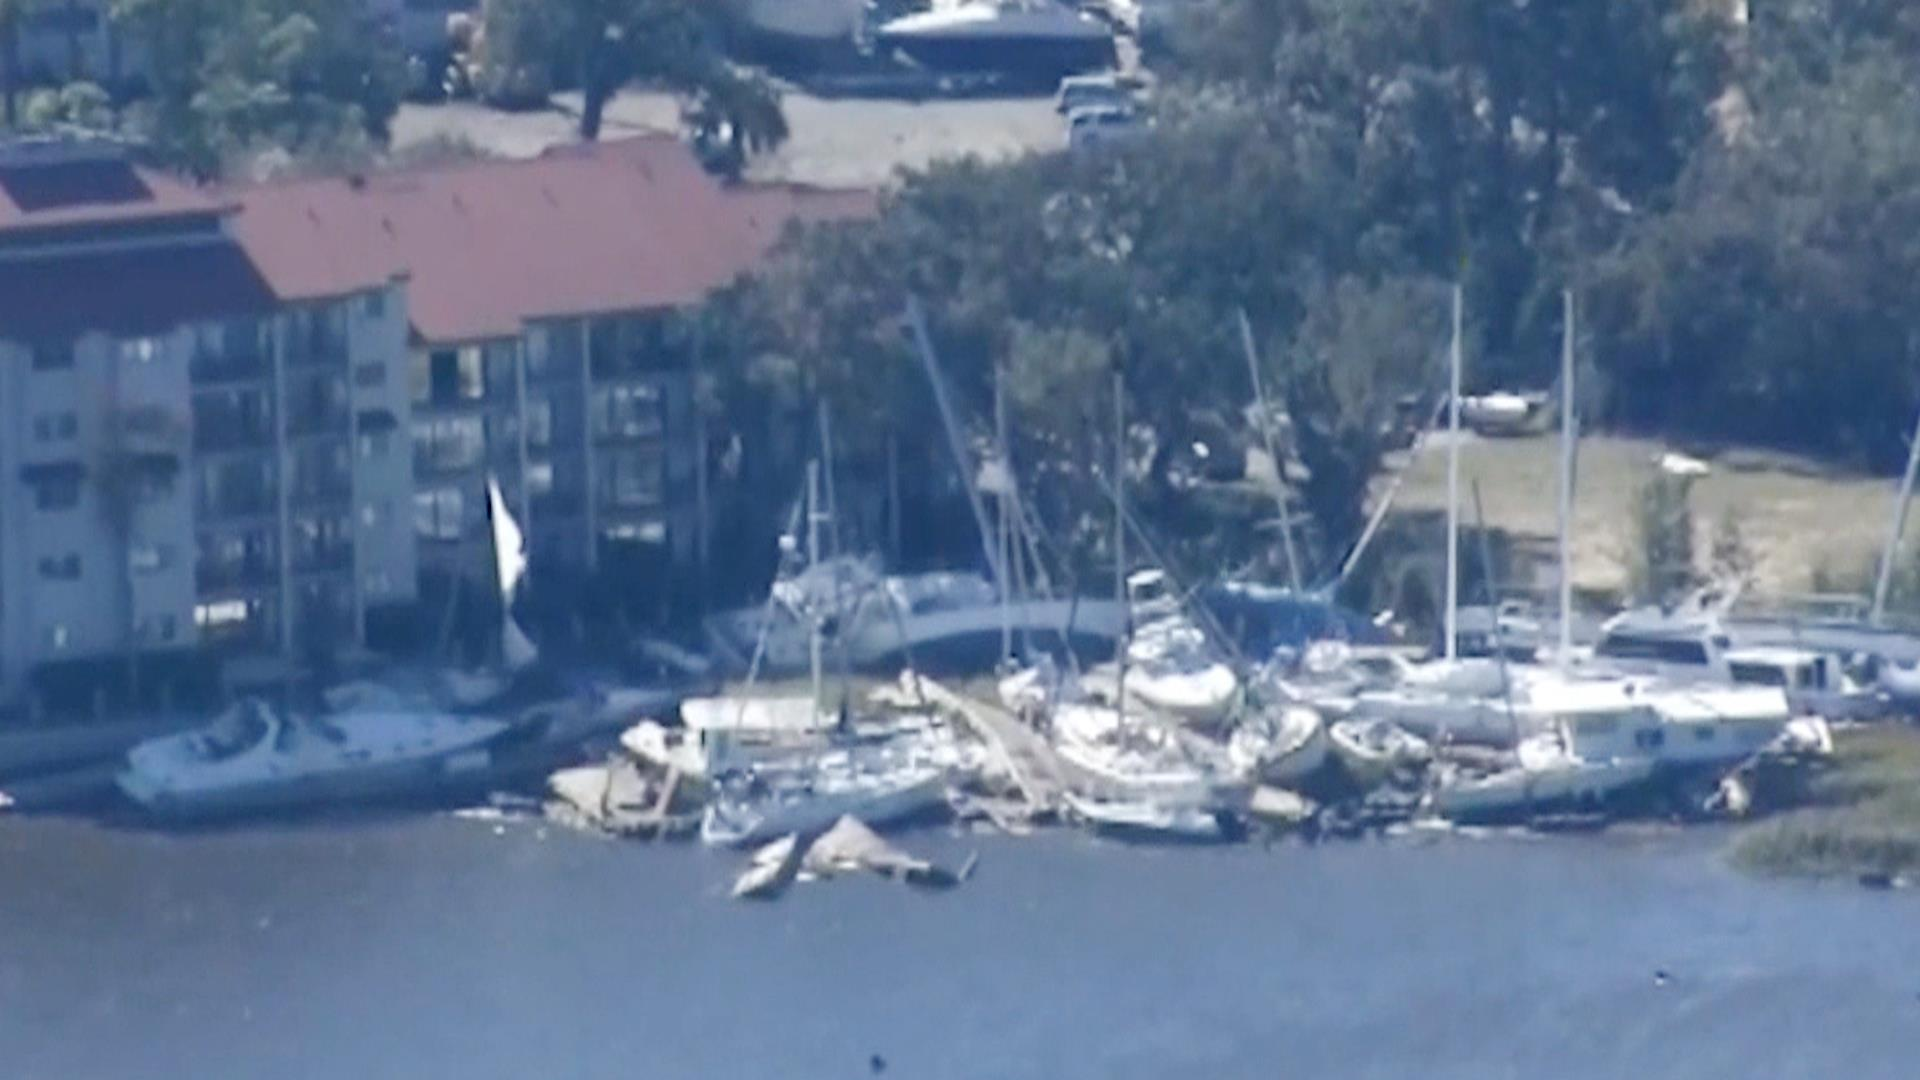 See Storm Damage in Hilton Head From Hurricane Matthew - NBC